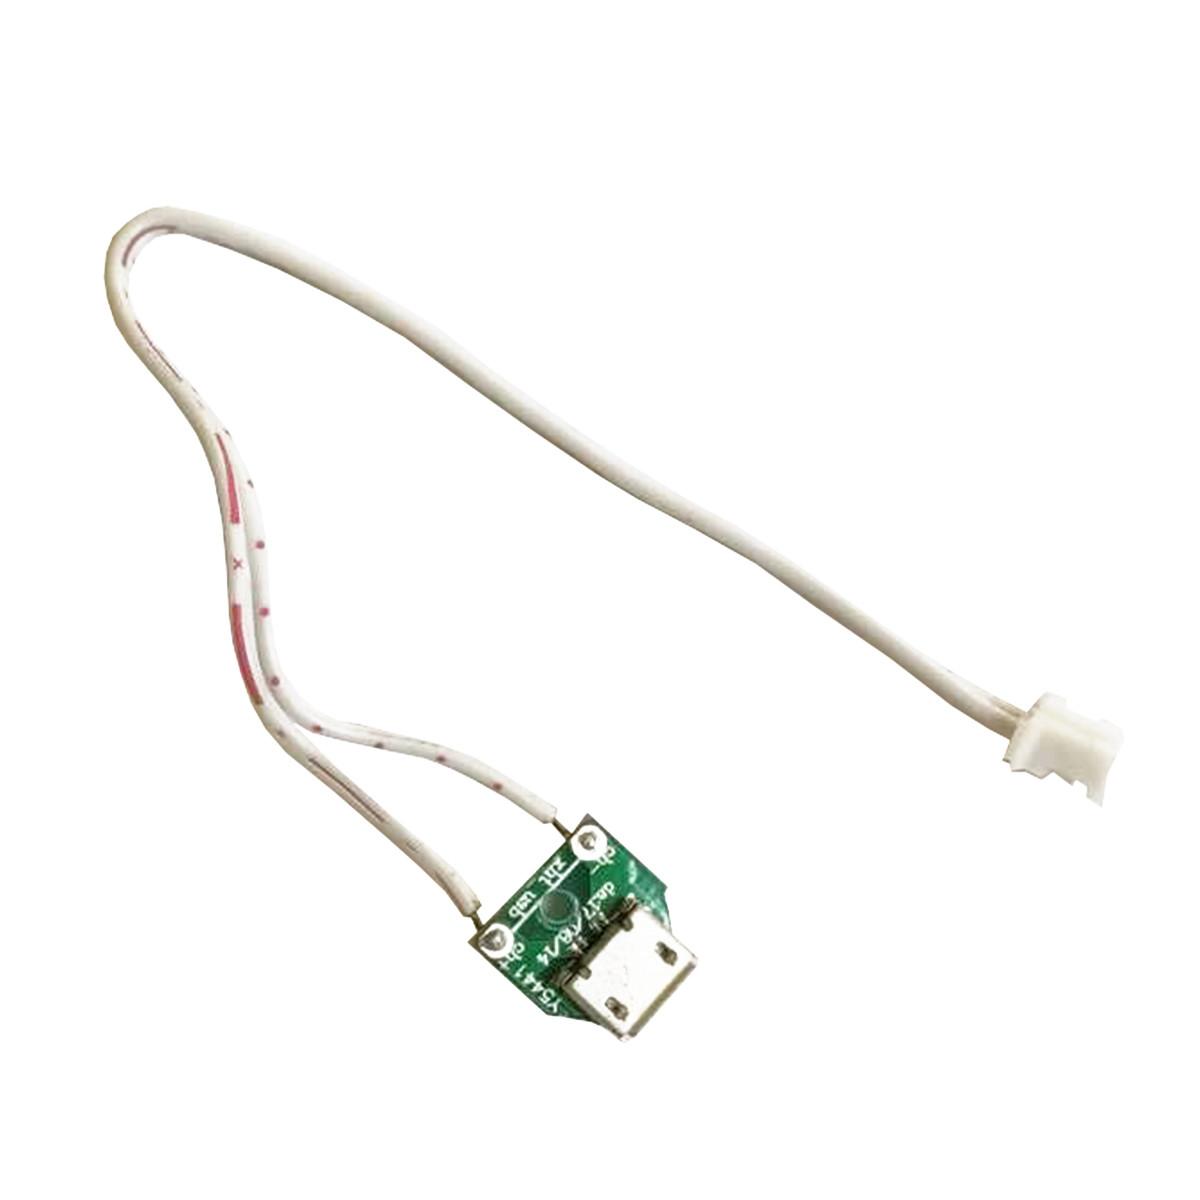 Аспиратор запчасти LITTLE BEES (LB-008) разъем microUSB для зарядки